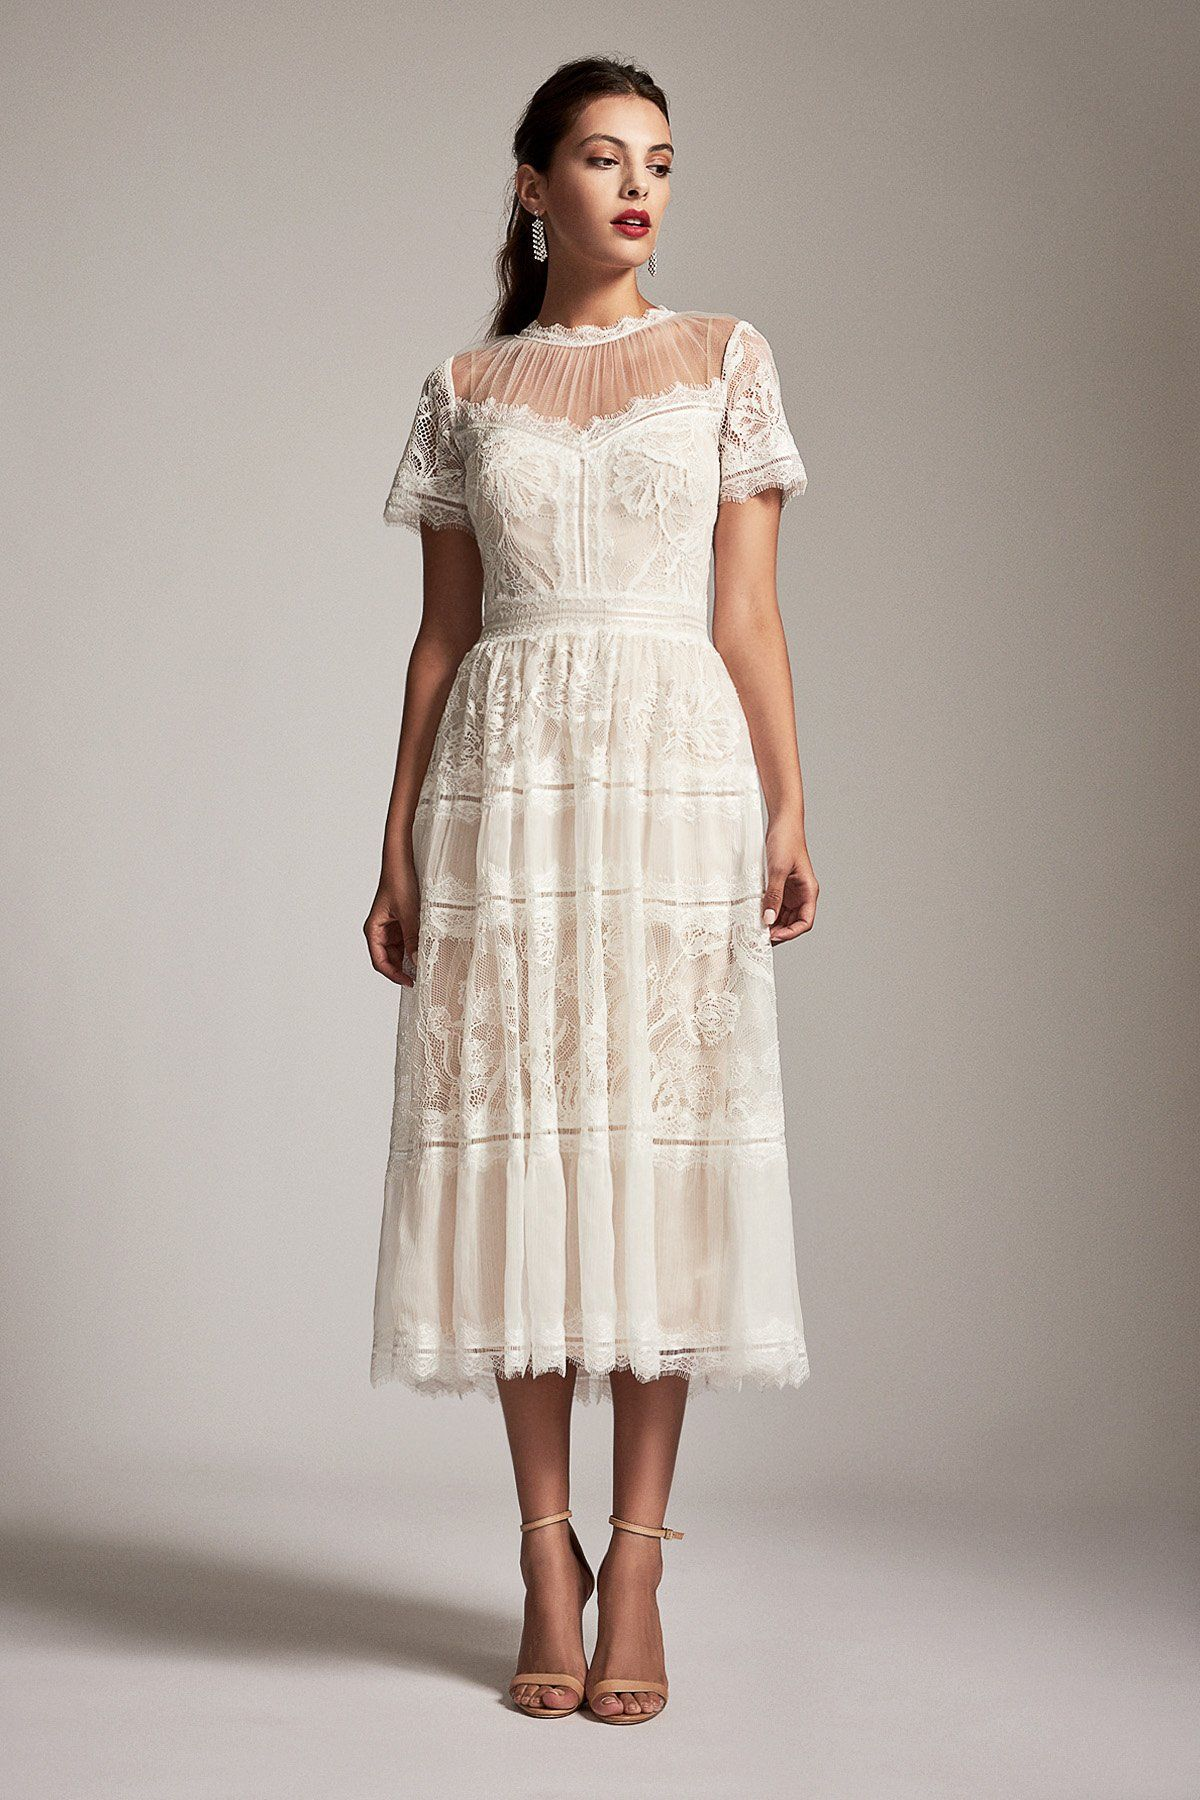 Tadashi Shoji Lace Jewel A Line Cocktail Dress In 2021 A Line Cocktail Dress Lace White Dress Dresses [ 1800 x 1200 Pixel ]